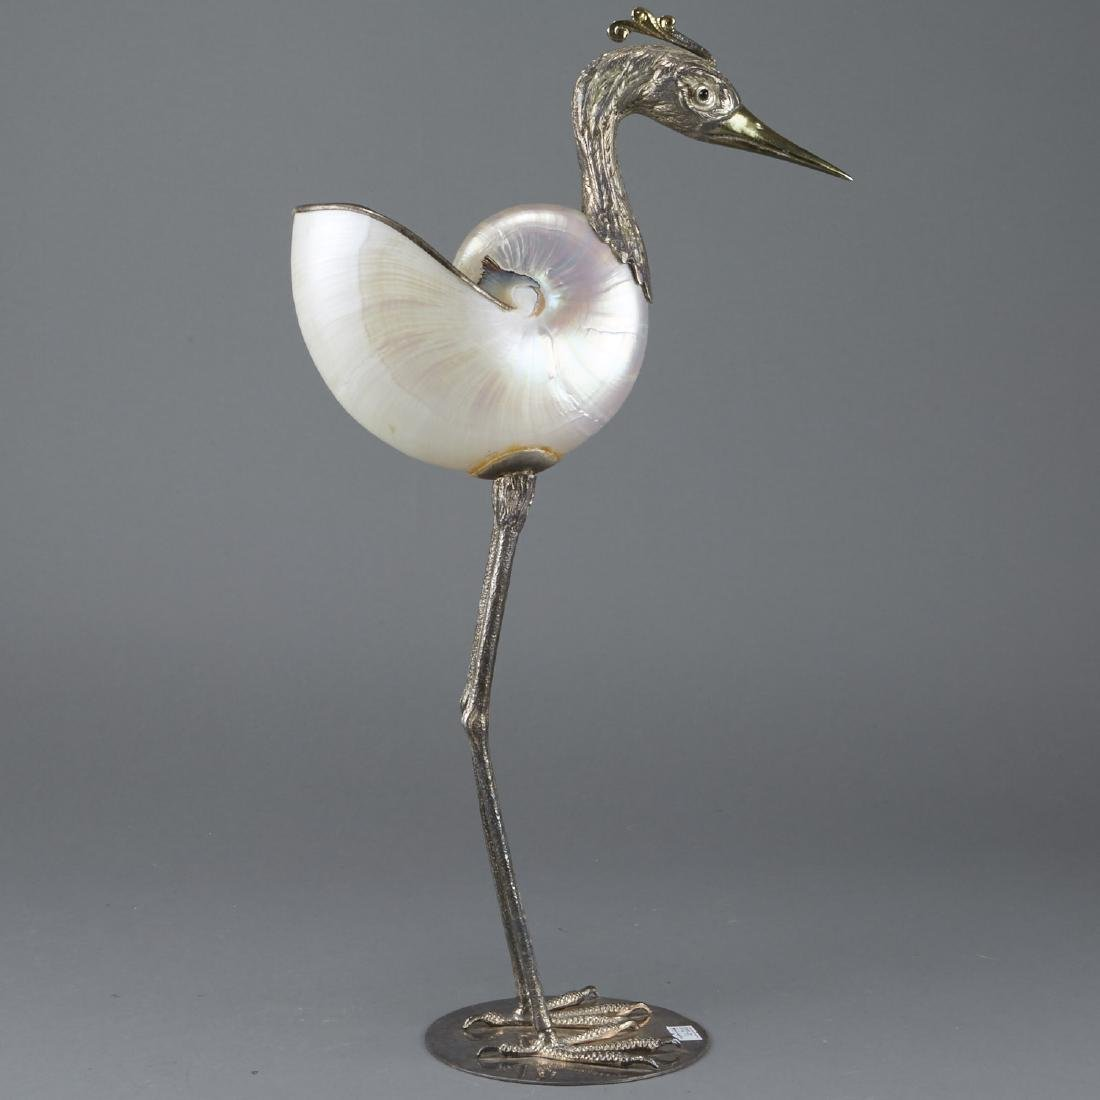 Binazzi Italian Silver and Nautilus Shell Egret - 3